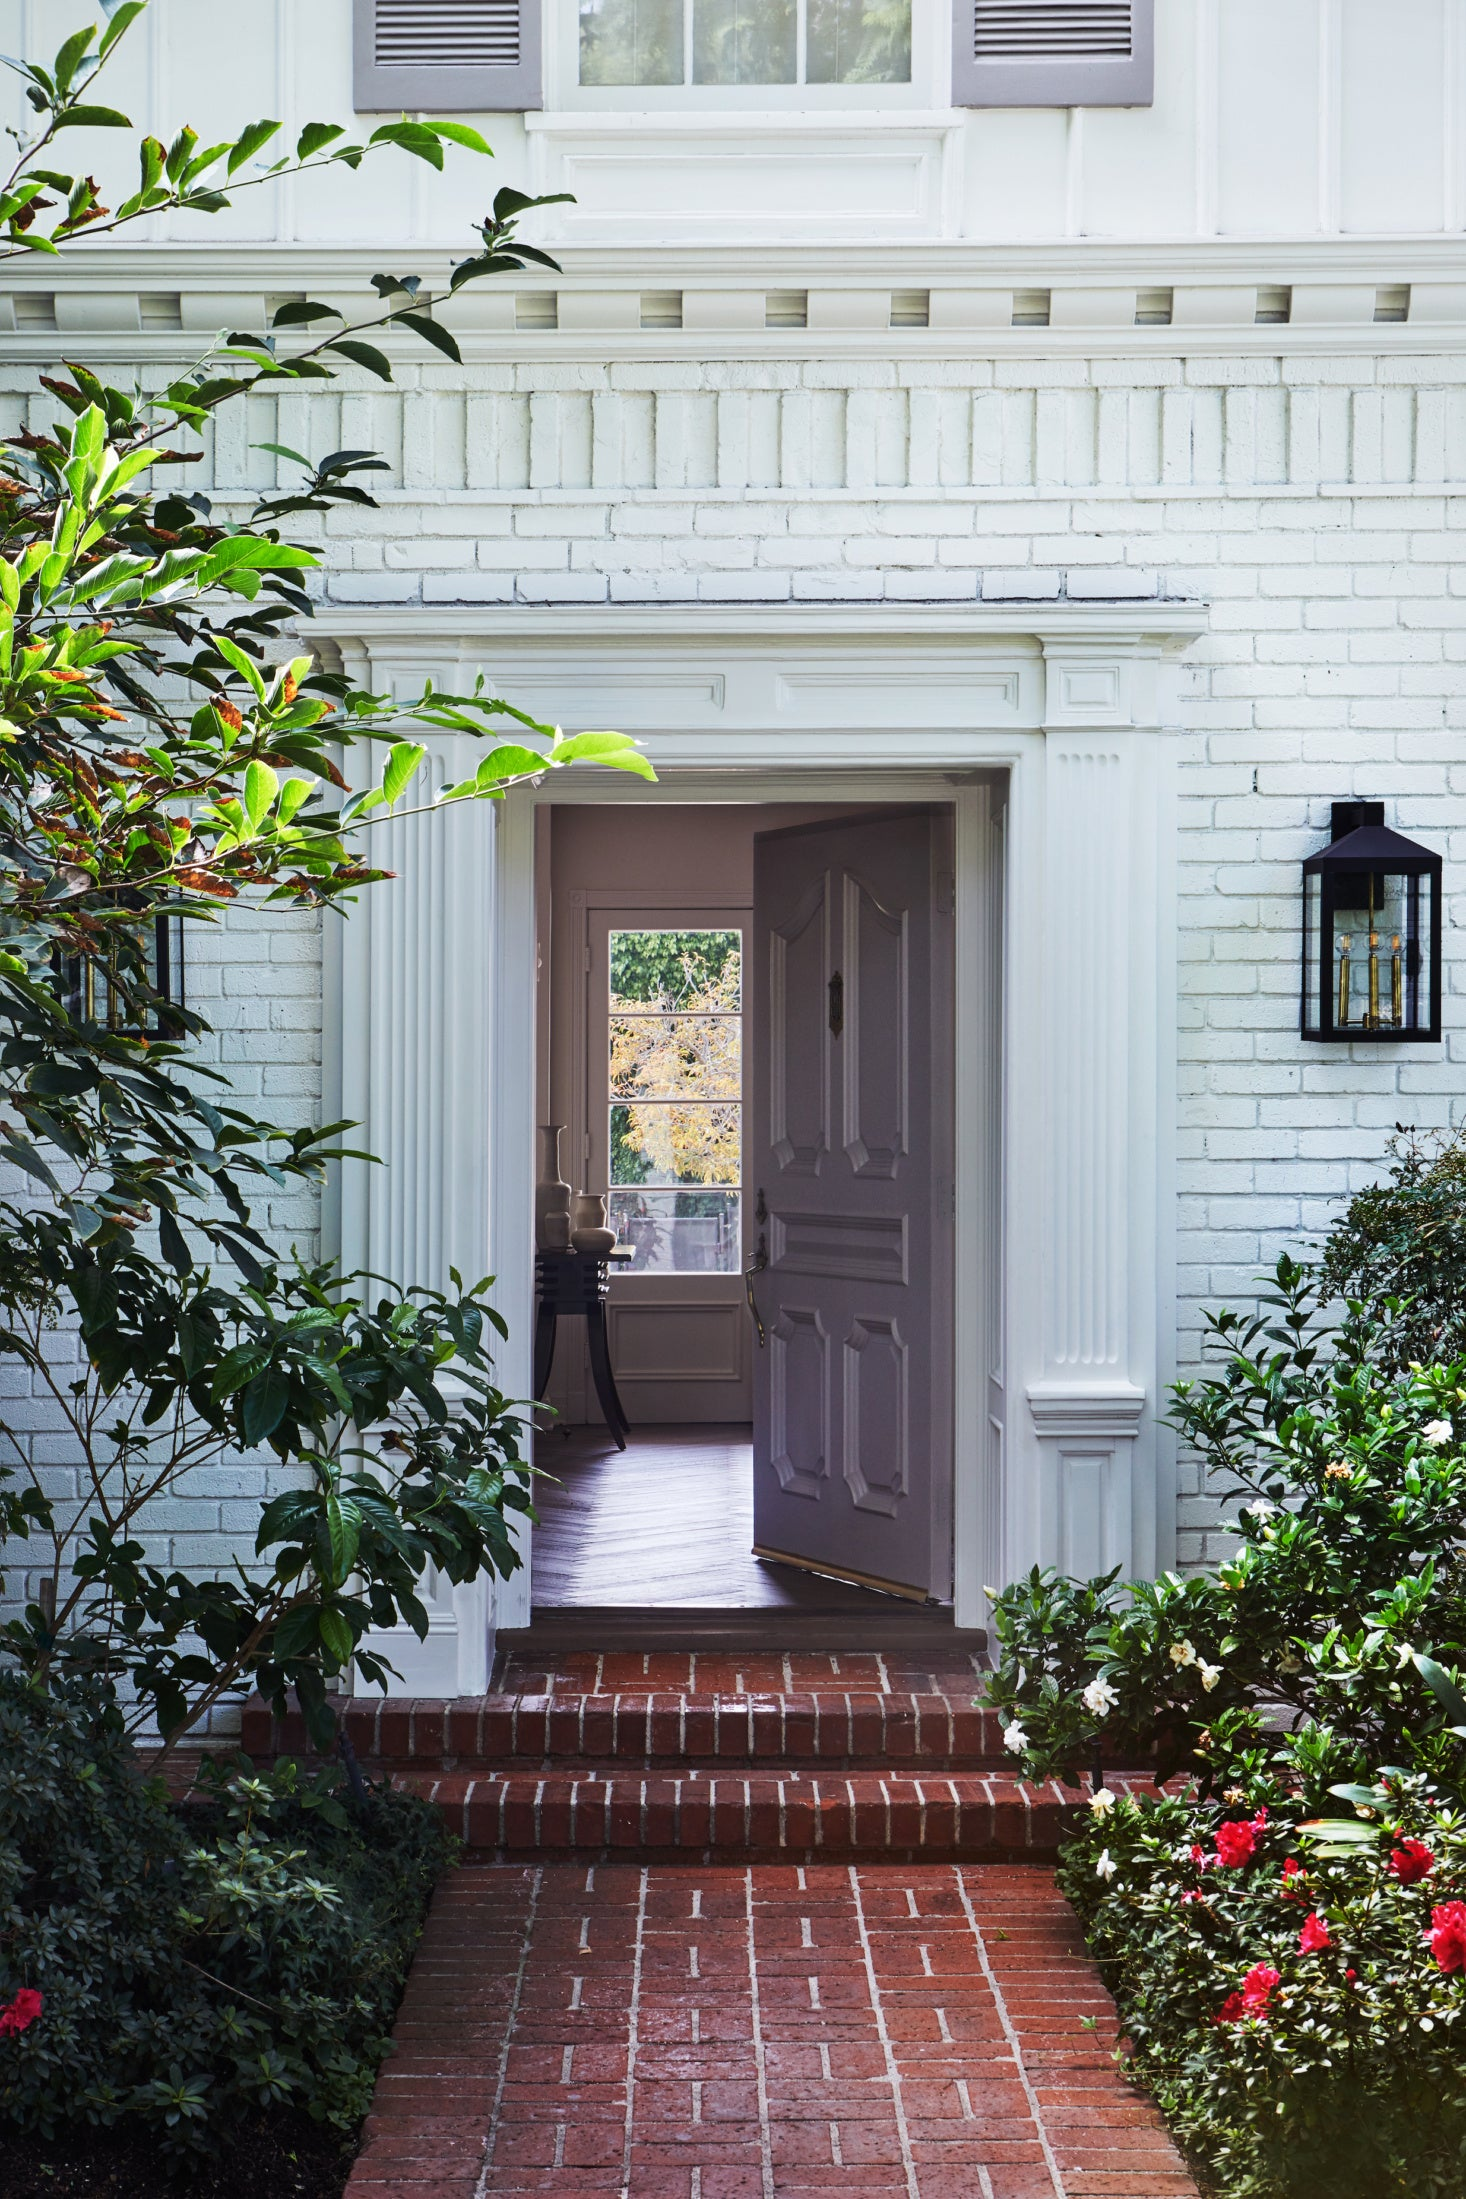 disc-interiors-holmby-hills-house-front-door-1a-1466×2199